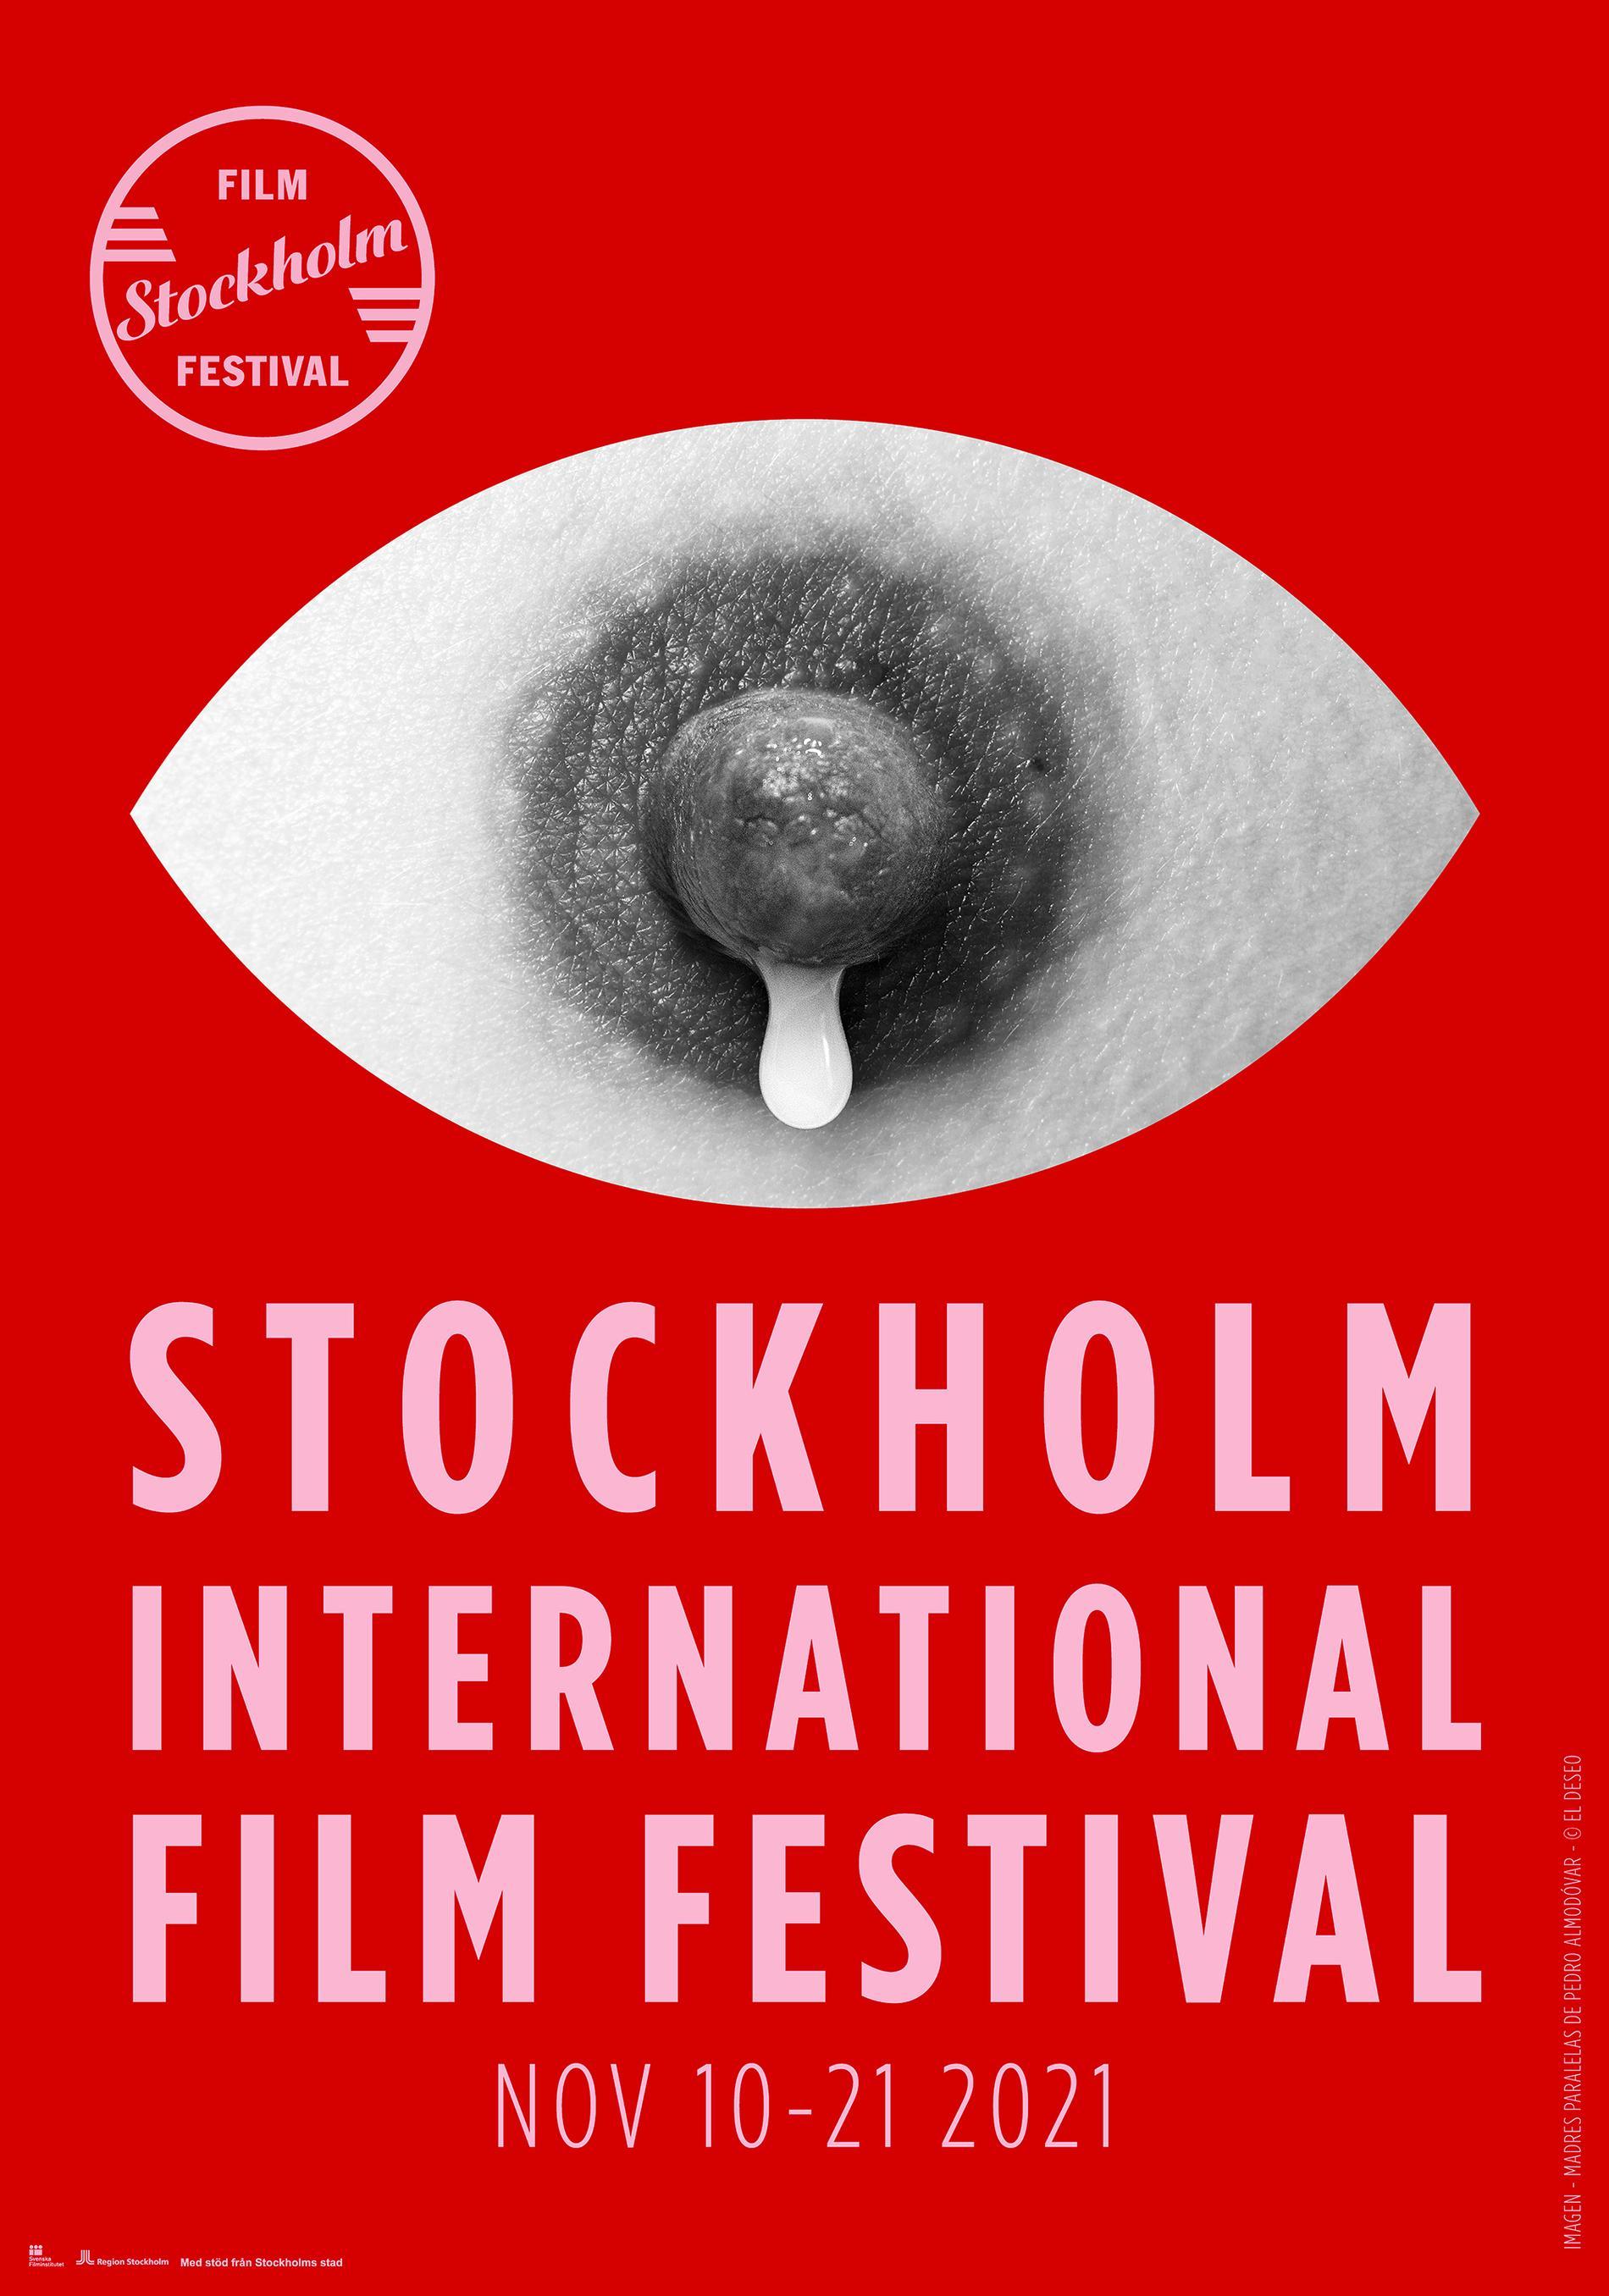 Affischen för Stockholm film festival.